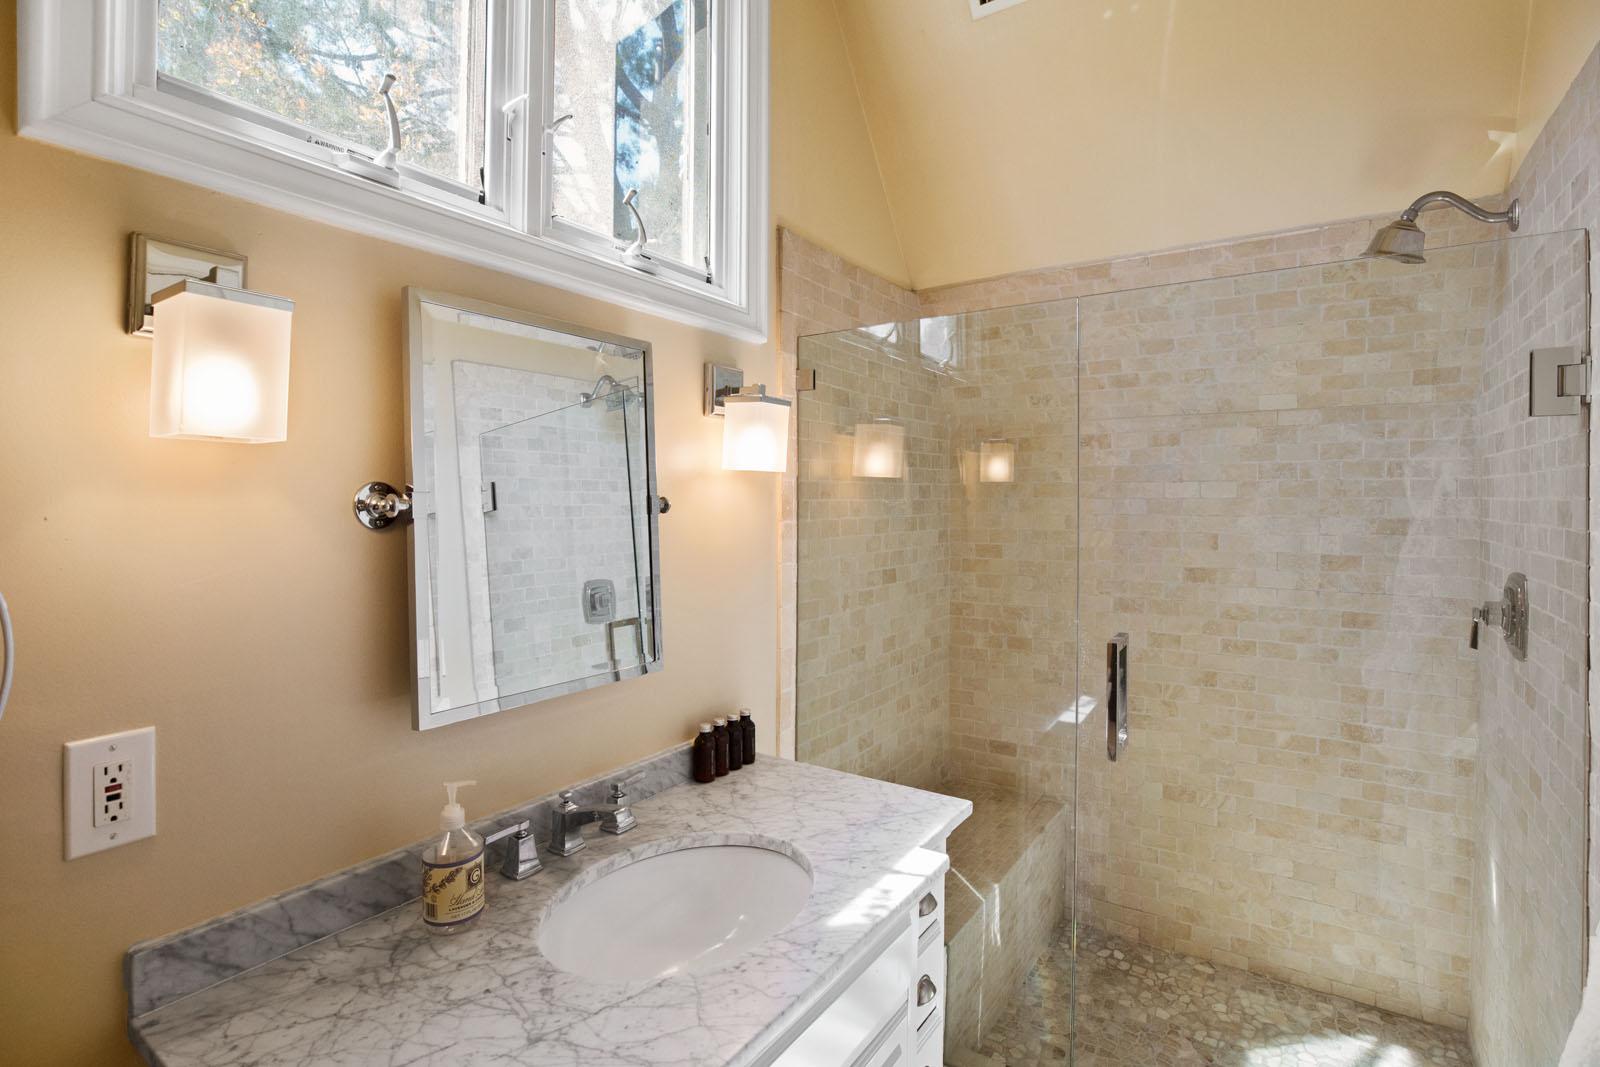 028 Loft Bathroom 1712 Manzanita Park Avenue Malibu For Sale Lease The Malibu Life Team Luxury Real Estate.jpg